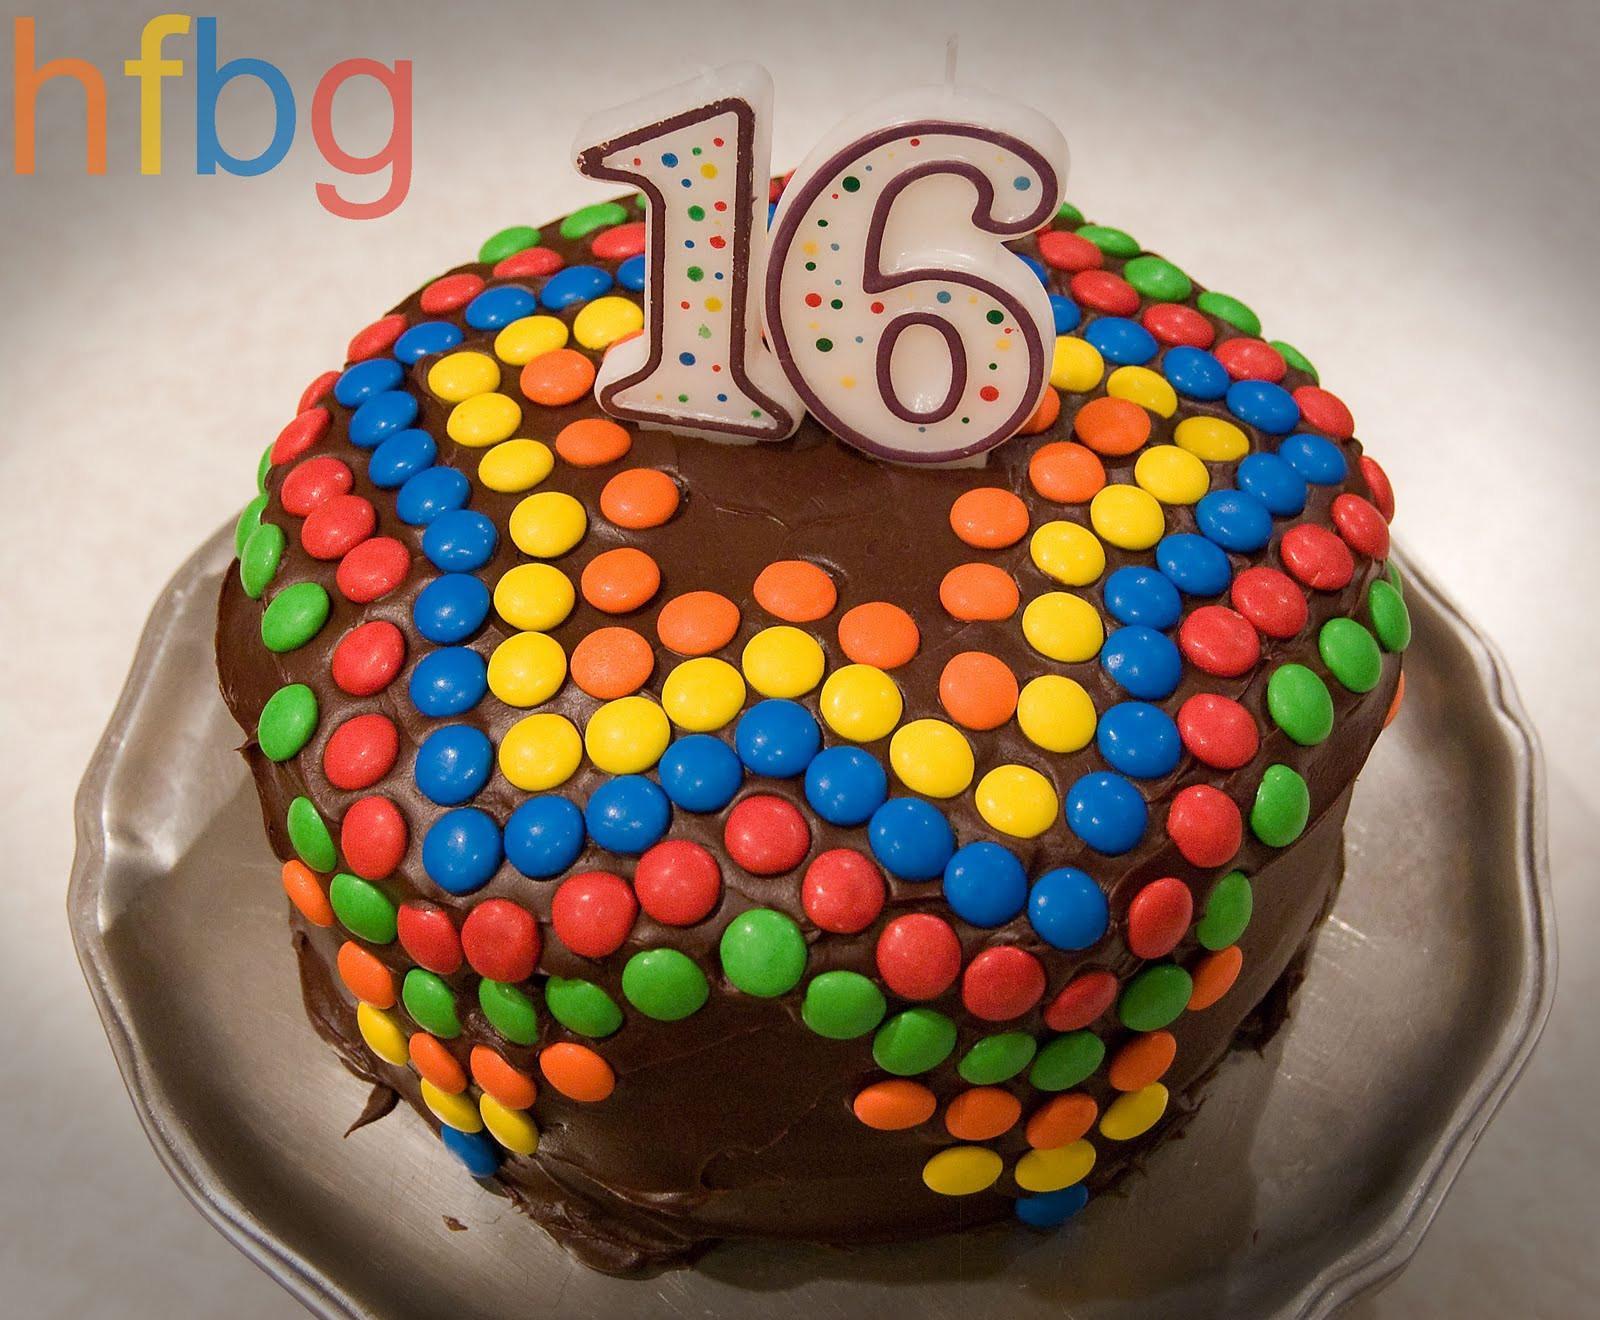 Homemade Birthday Cake Ideas  have fun be good Homemade Birthday Cake Part 2